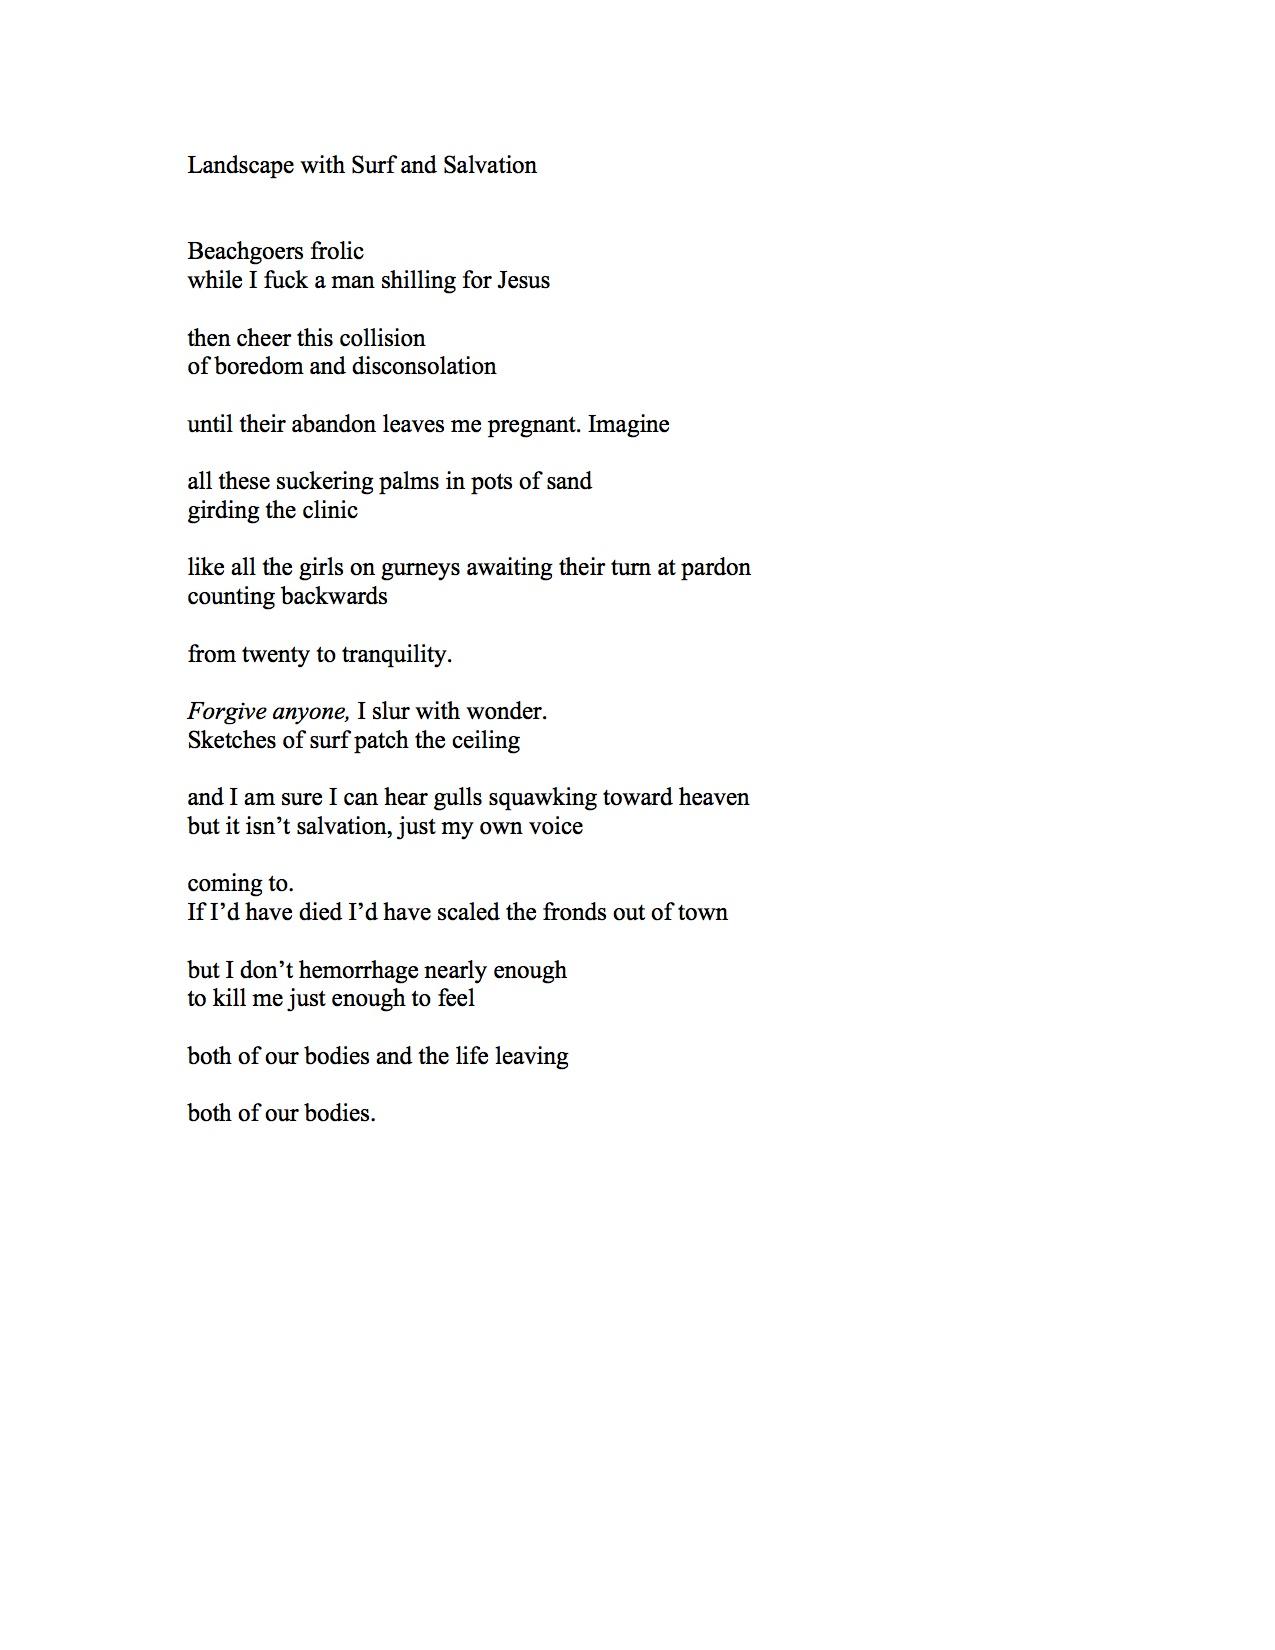 Poems Excuses Please Excuse This Poem